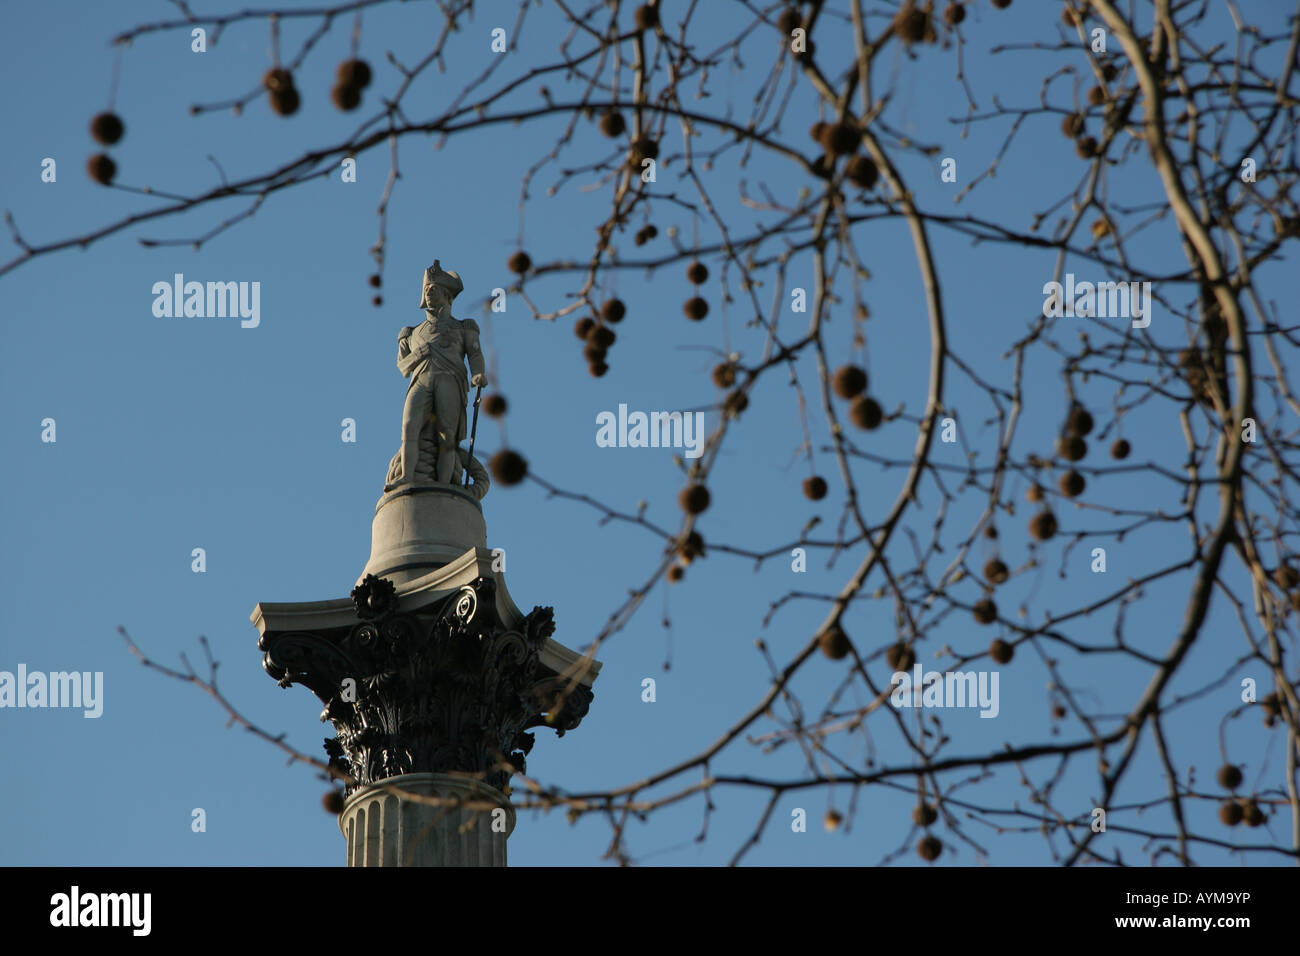 Columna de Nelson en Trafalgar Square, Londres, visto a través de las llanuras de Londres las ramas de un árbol Imagen De Stock